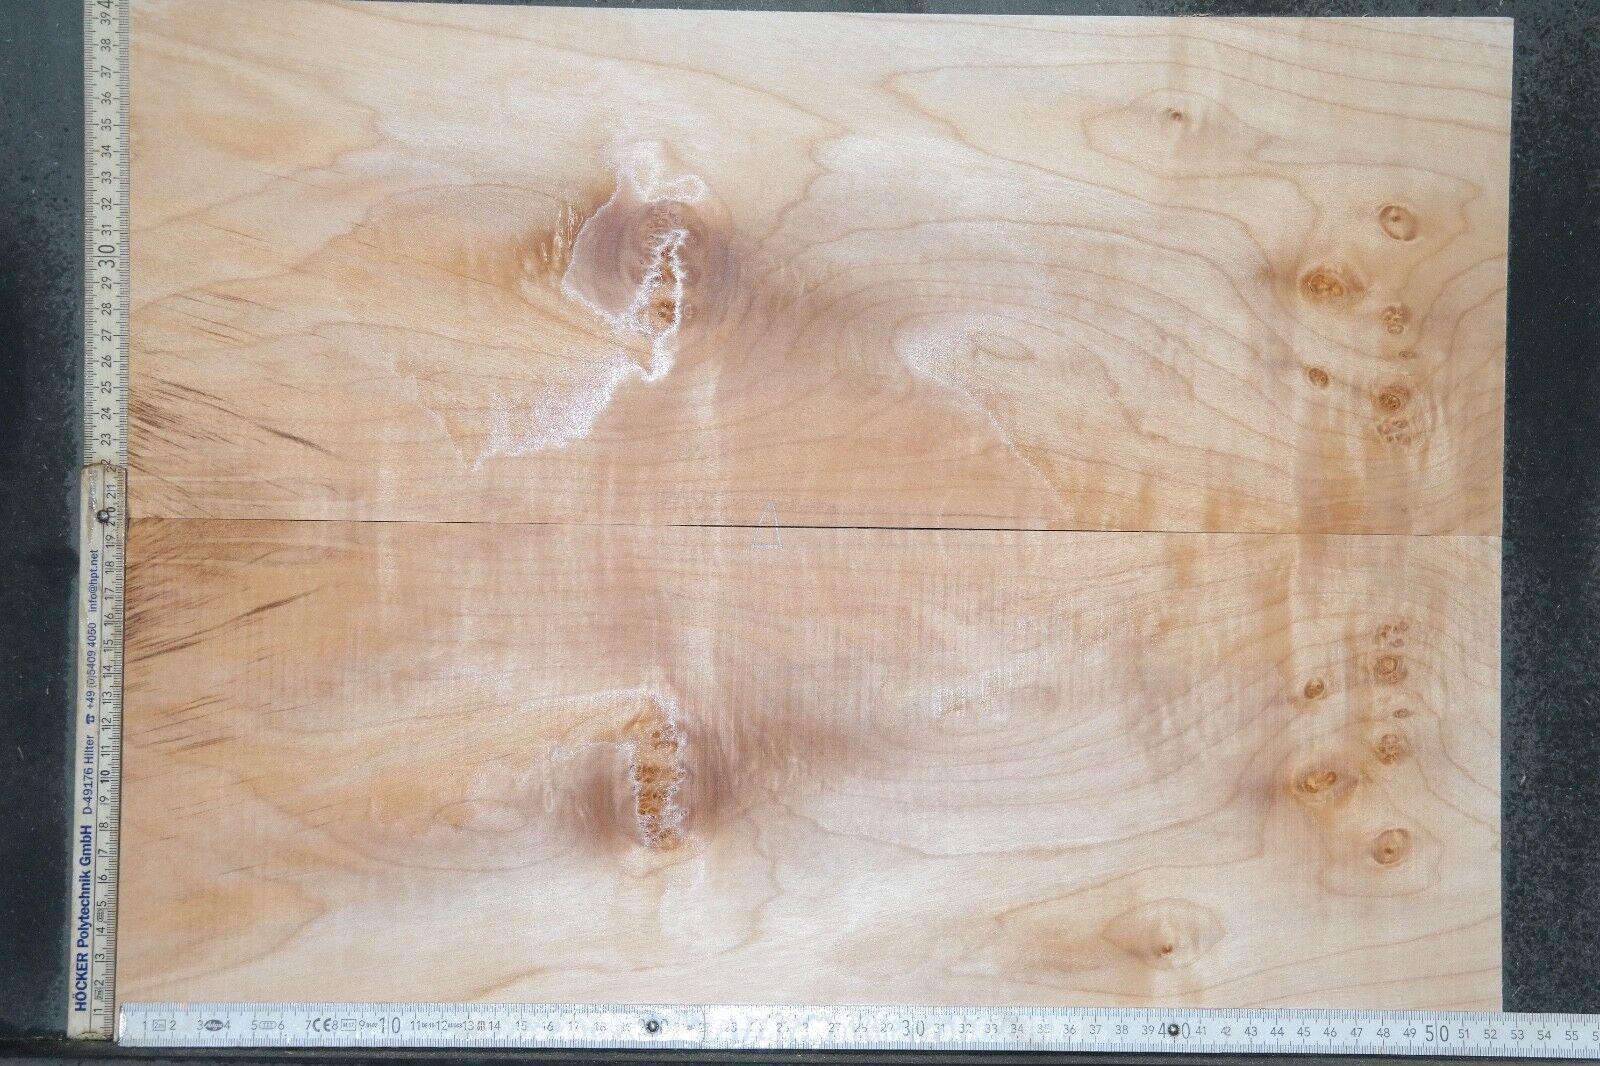 Tonewood Riegel maple Ahorn flamed Aufleimer 6,7 Guitar Tonholz Curly Topset 105